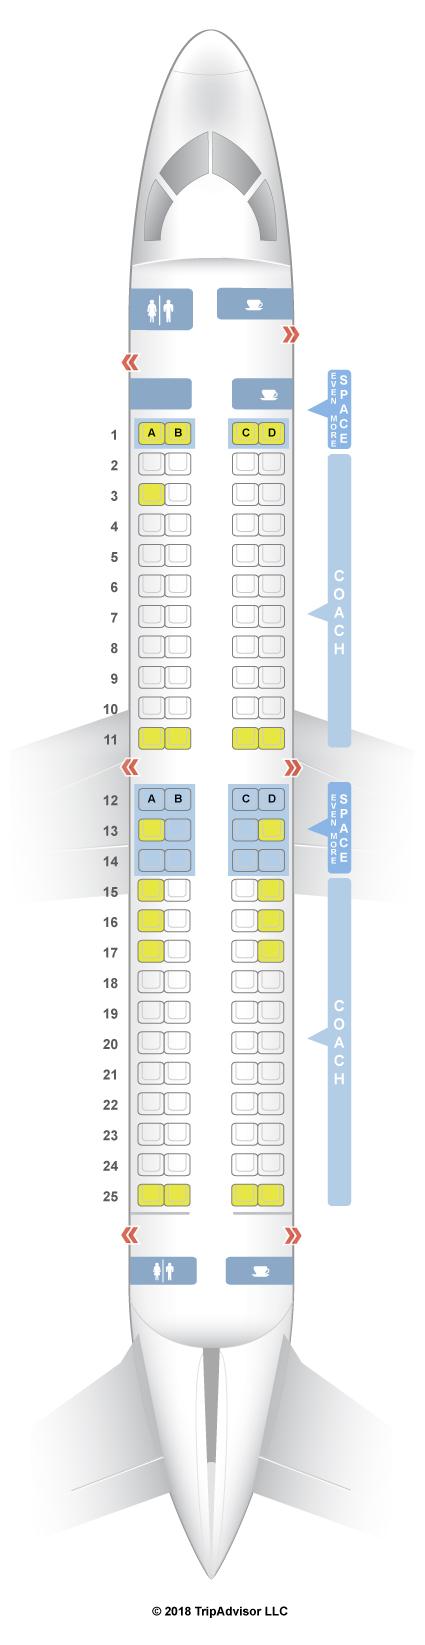 Seatguru Seat Map Jetblue Embraer E